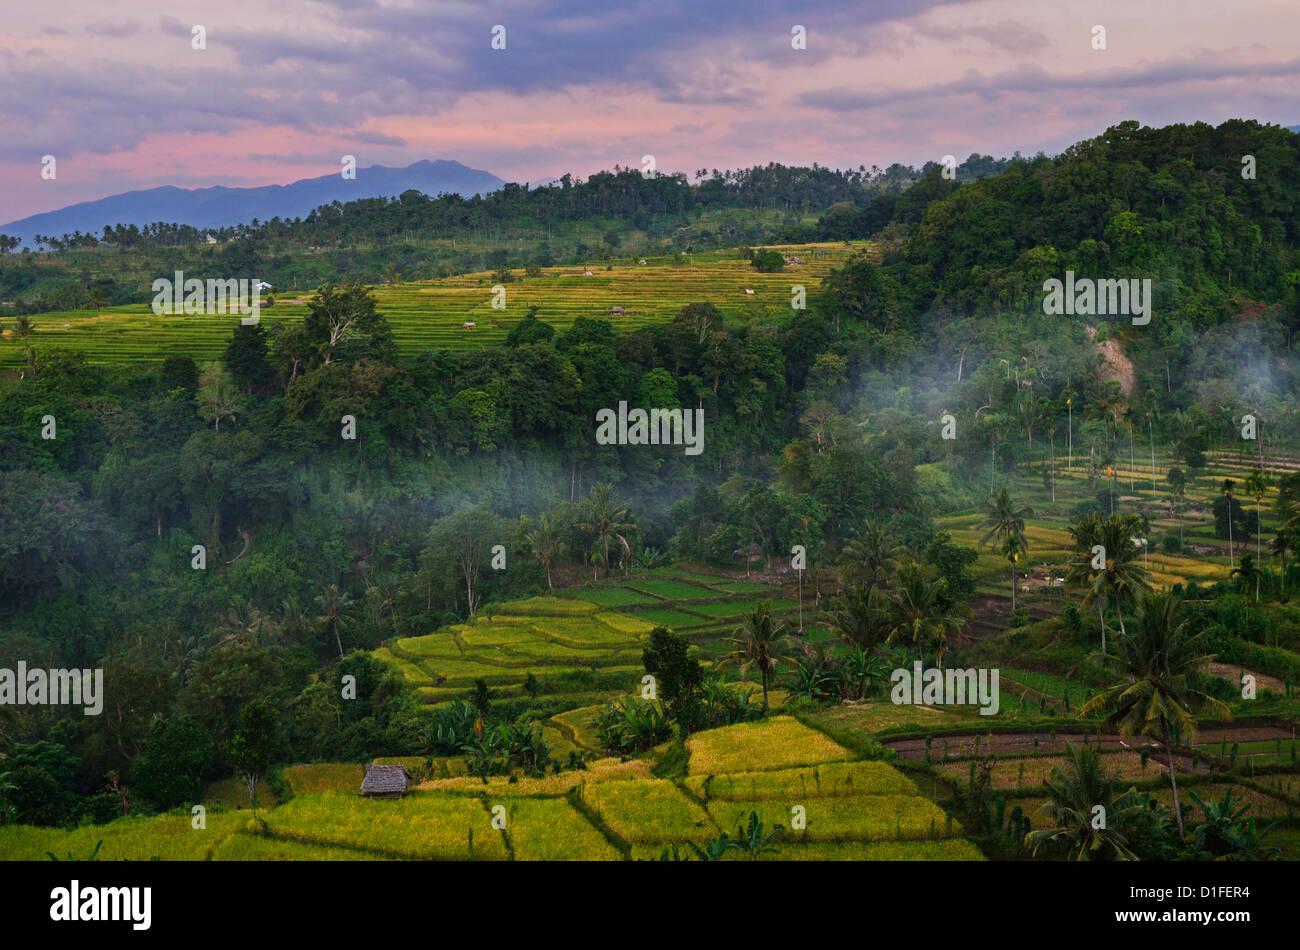 Regenwald und Felder, Senaru, Lombok, Indonesien, Südostasien, Asien Stockbild